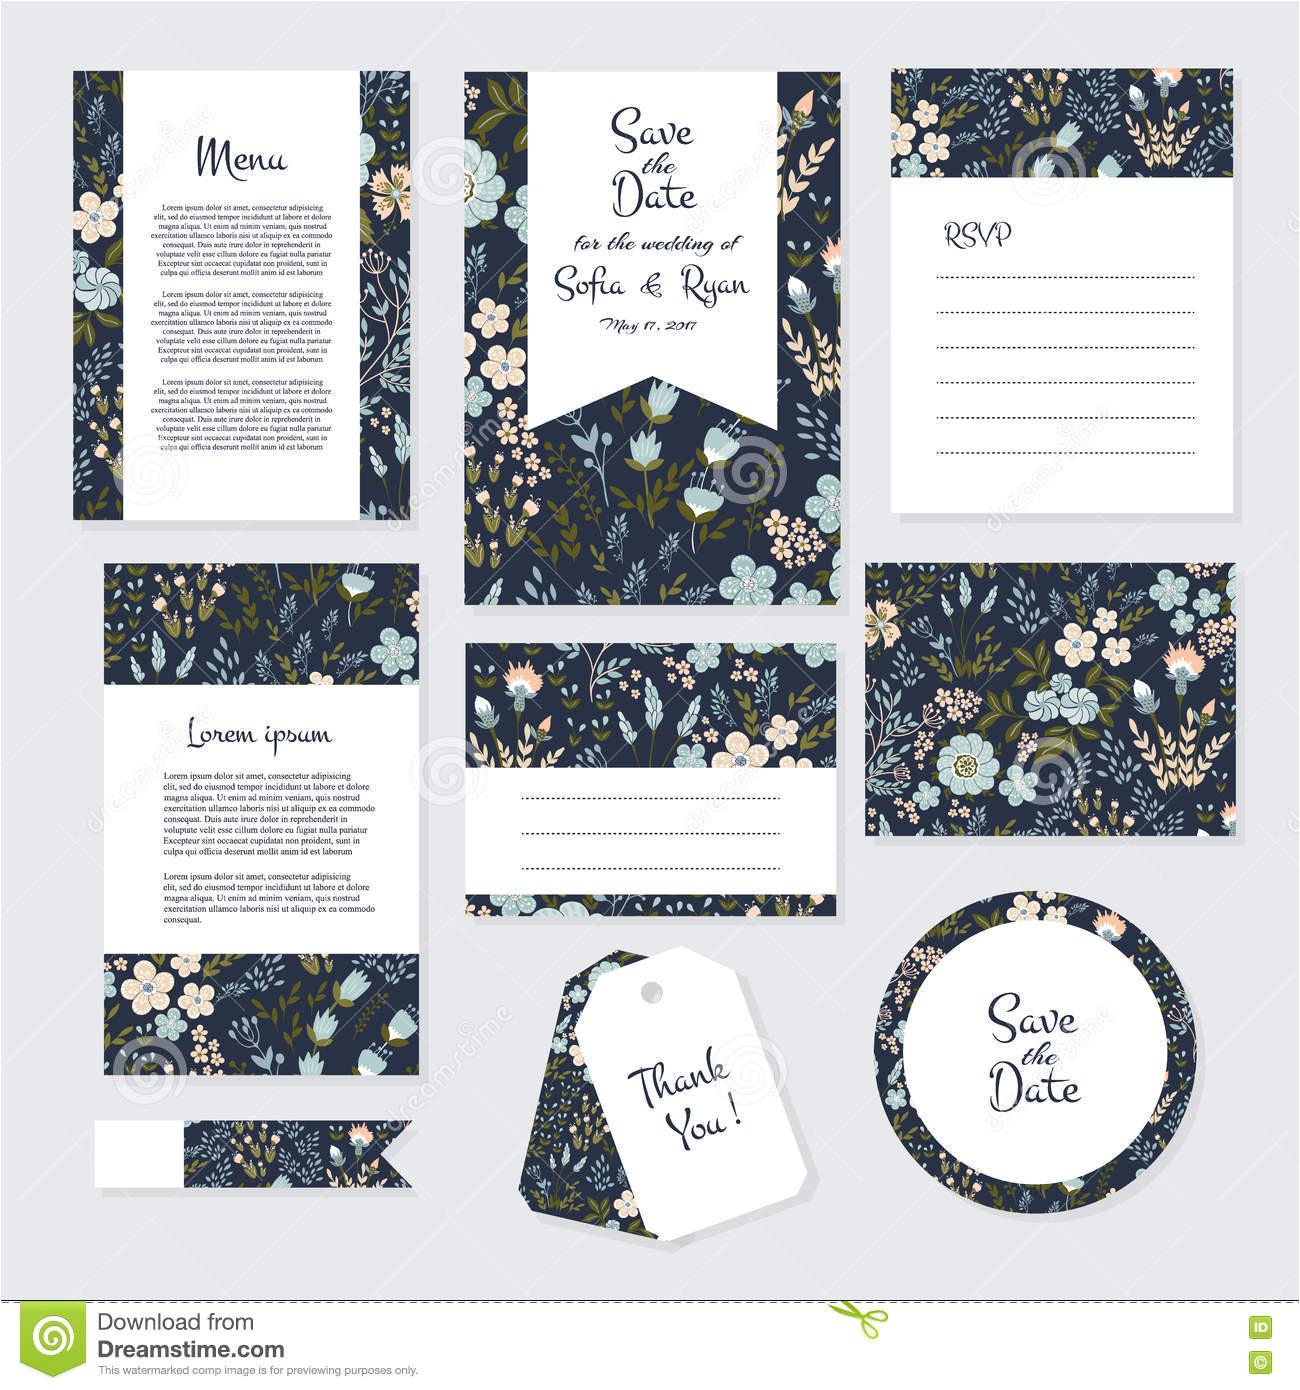 vector gentle wedding cards template flower design invitation save date rsvp menu thank you card 79168976 jpg